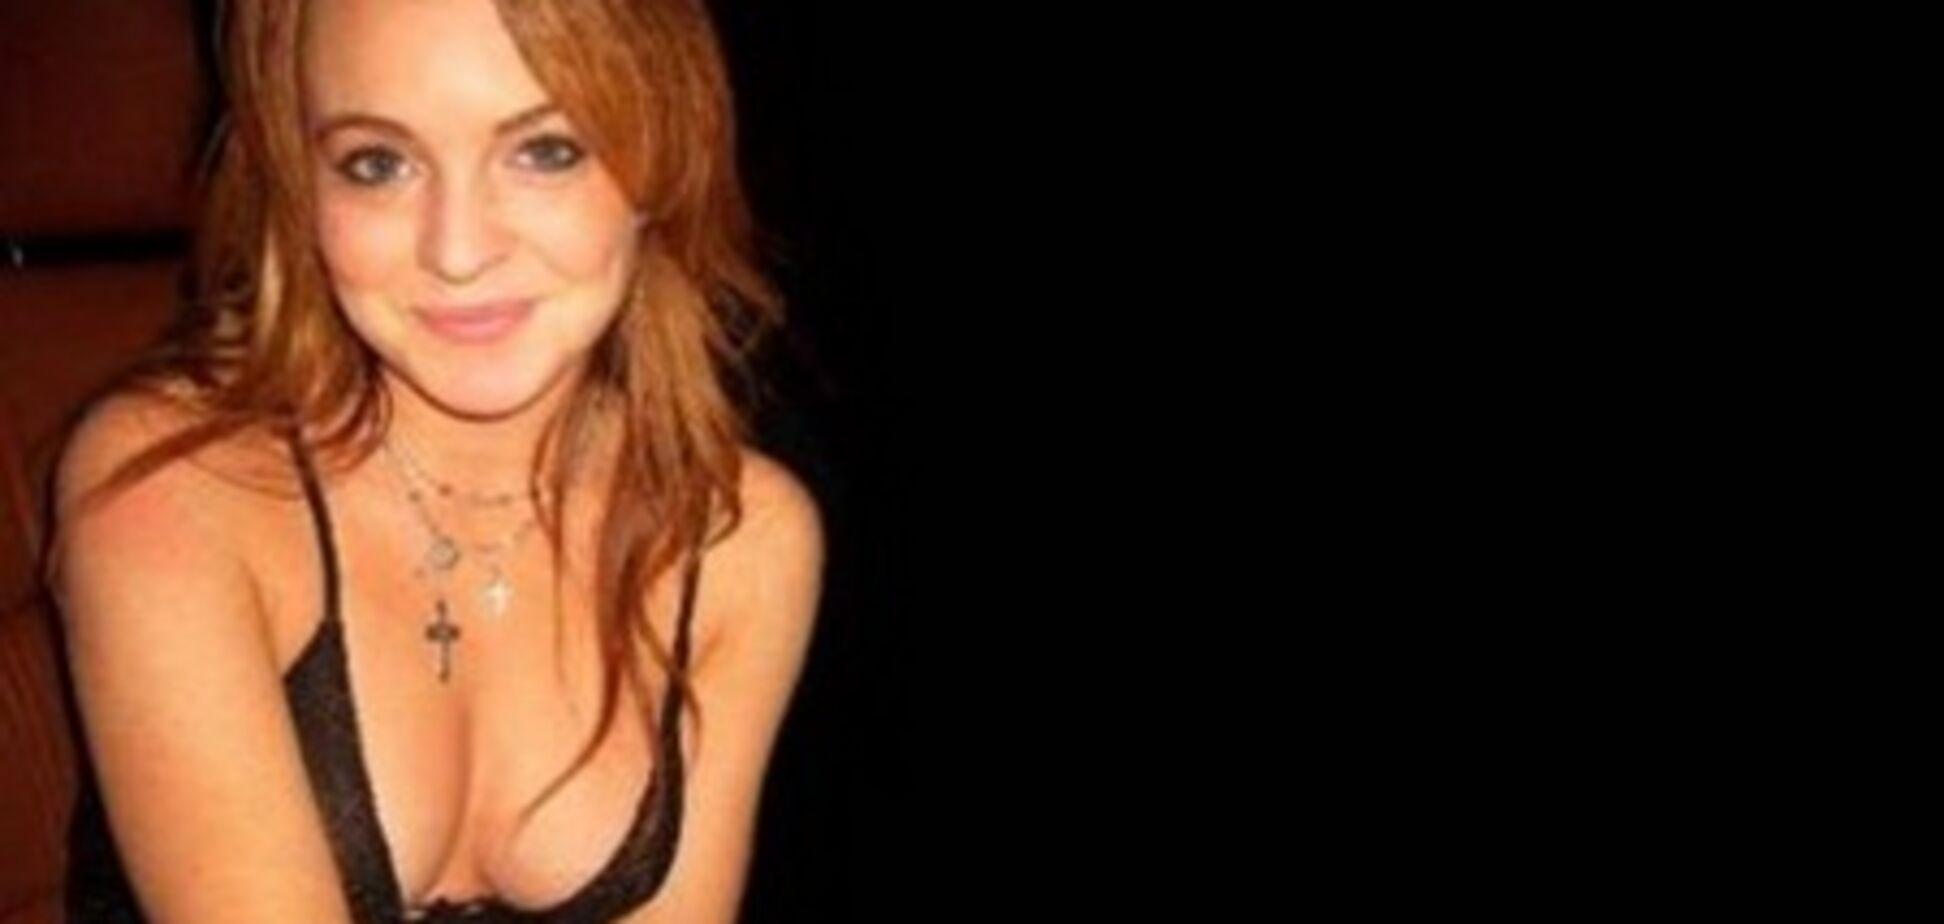 Линдсей Лохан попала в ДТП: актриса госпитализирована